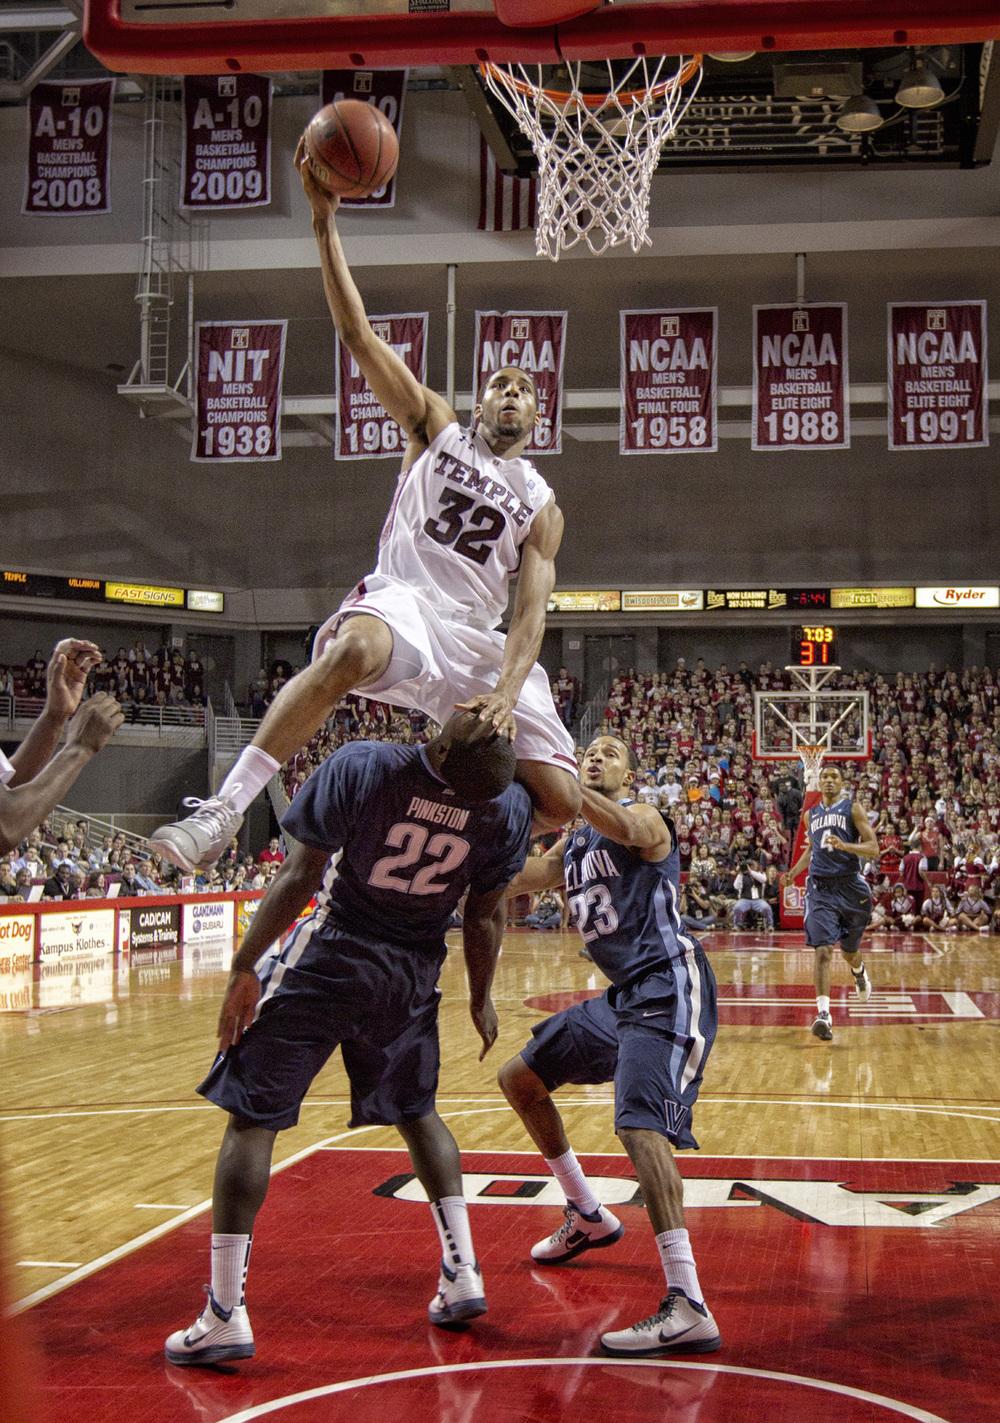 Basketball_007.jpg